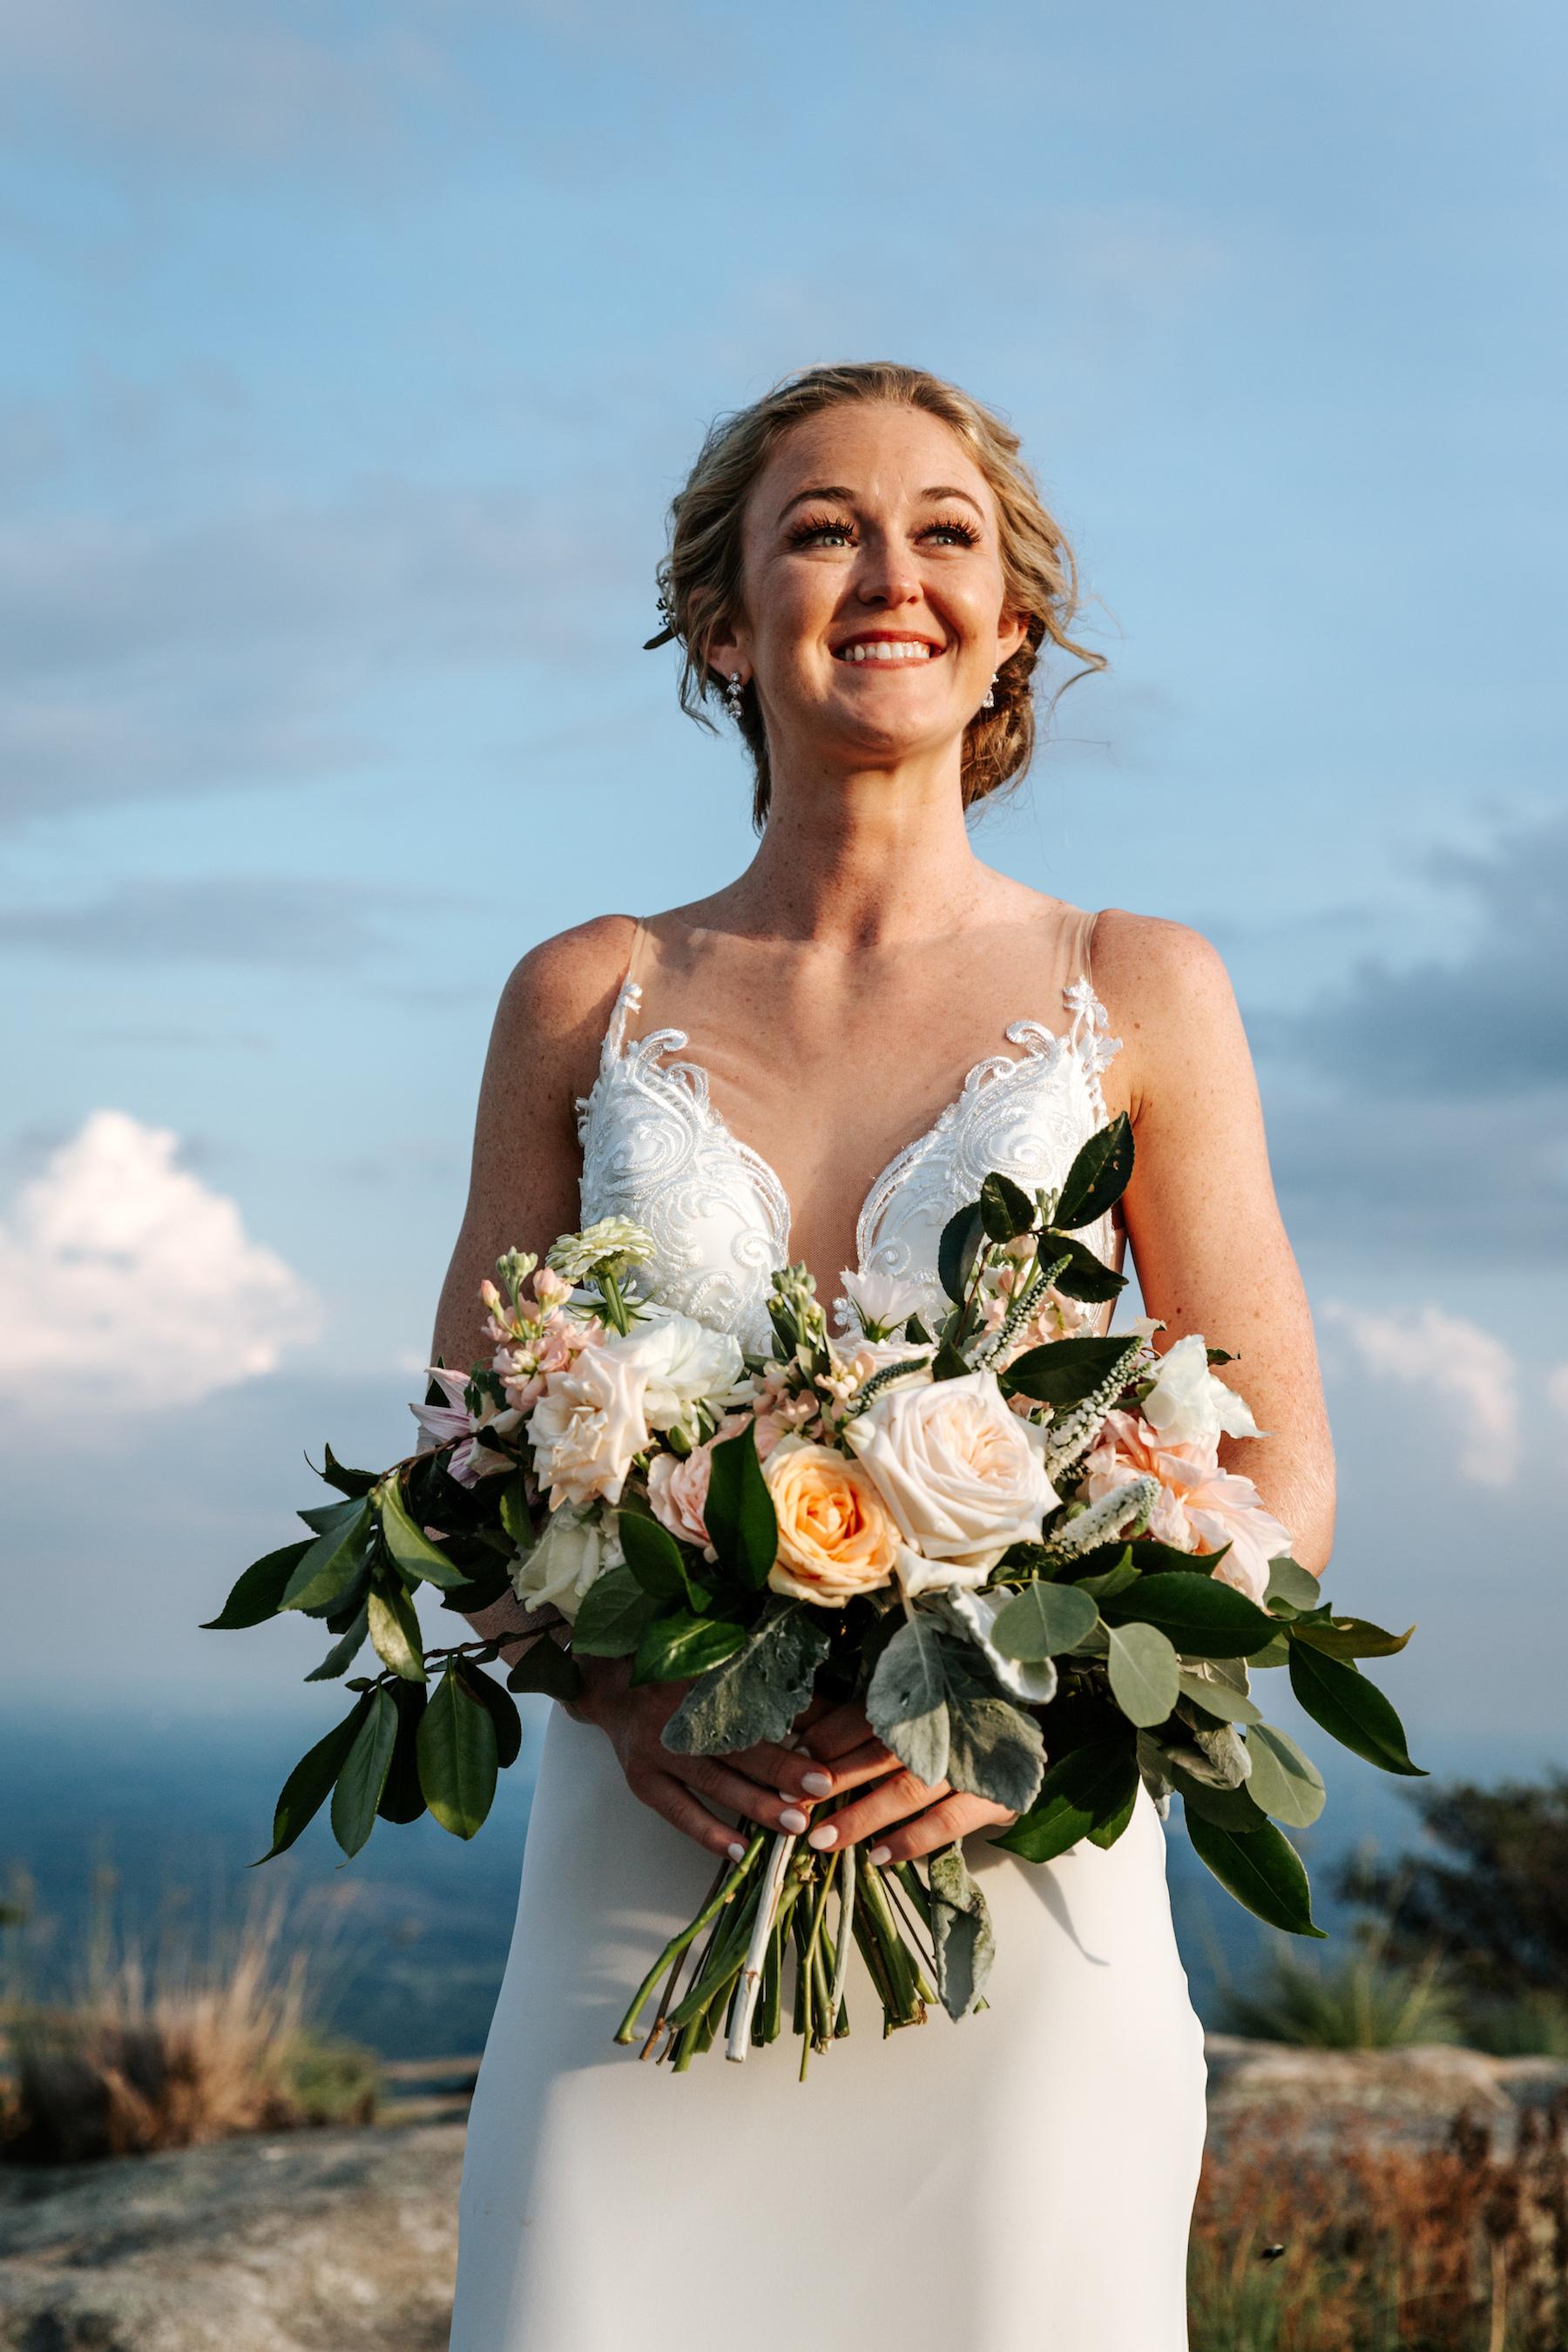 wedding-engagement-photographer-spartanburg-greenville-columbia-carolina-south-north-537.JPG